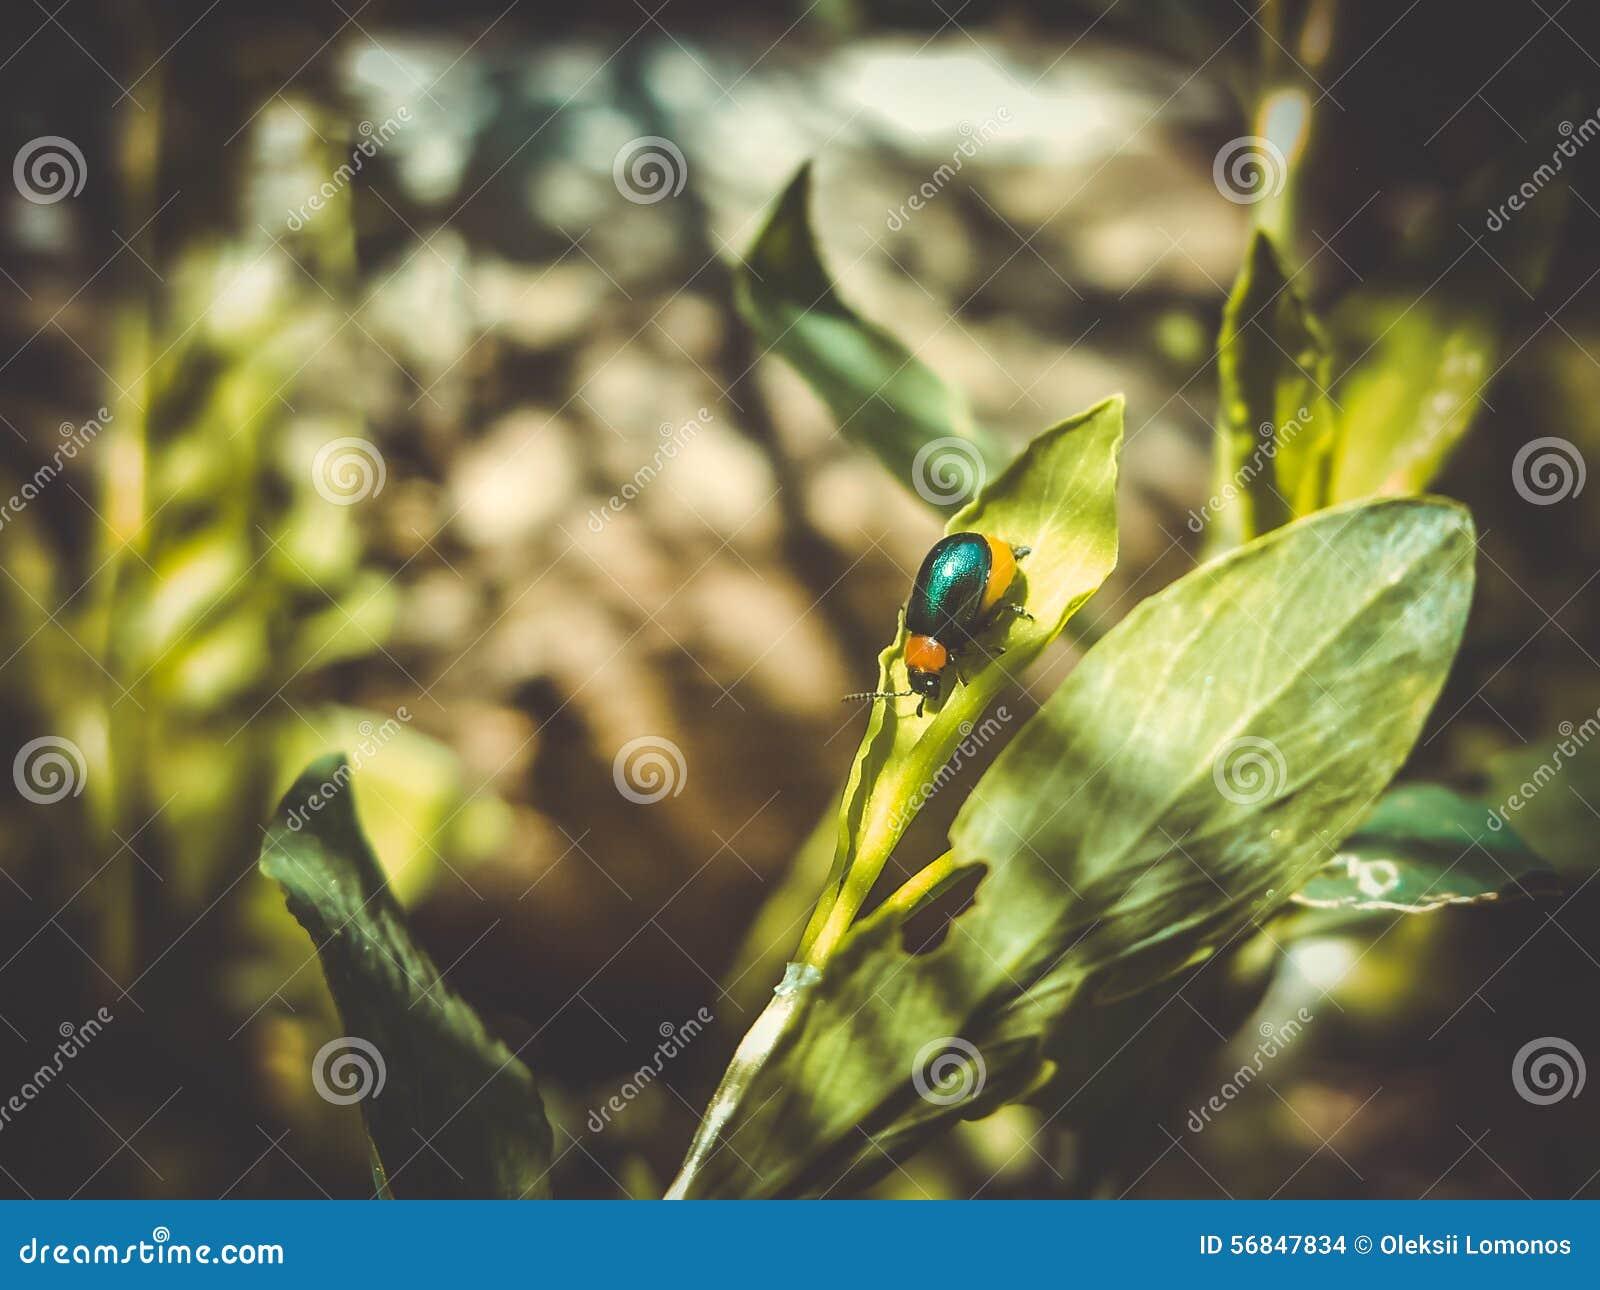 teeny tiny blue bug beautifully shimmers in the sun